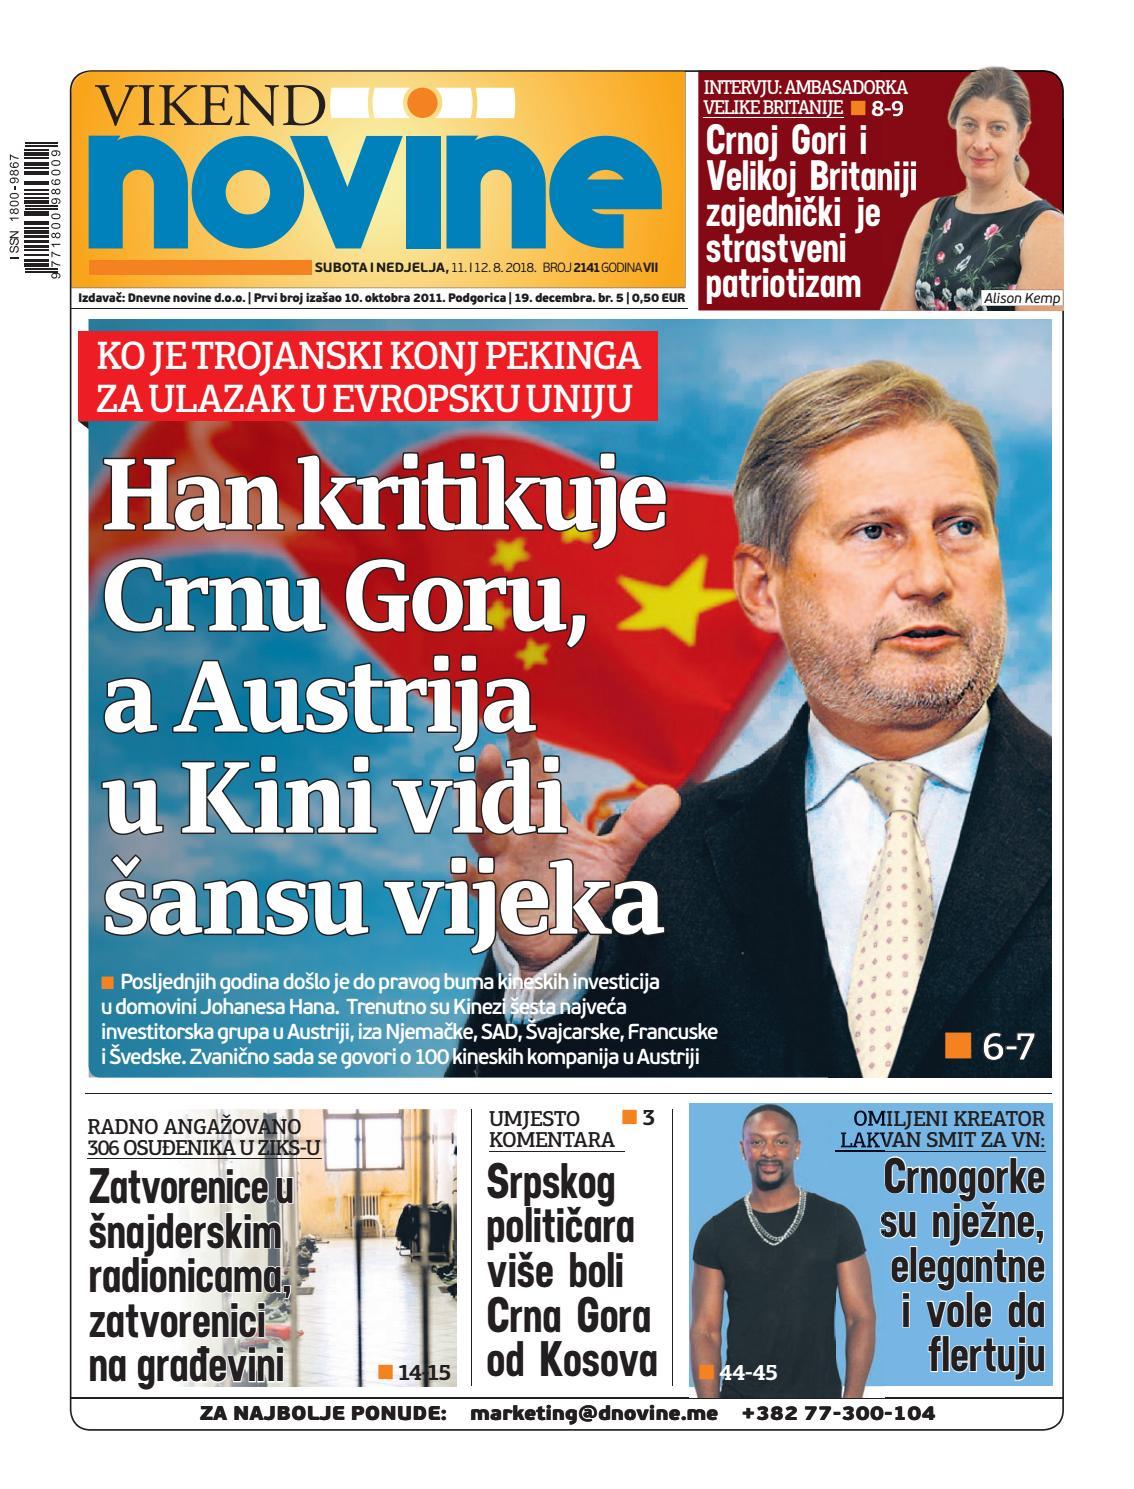 7440e1bbed2 Dnevne novine 11-12. avgust 2018. by Dnevne Novine - issuu